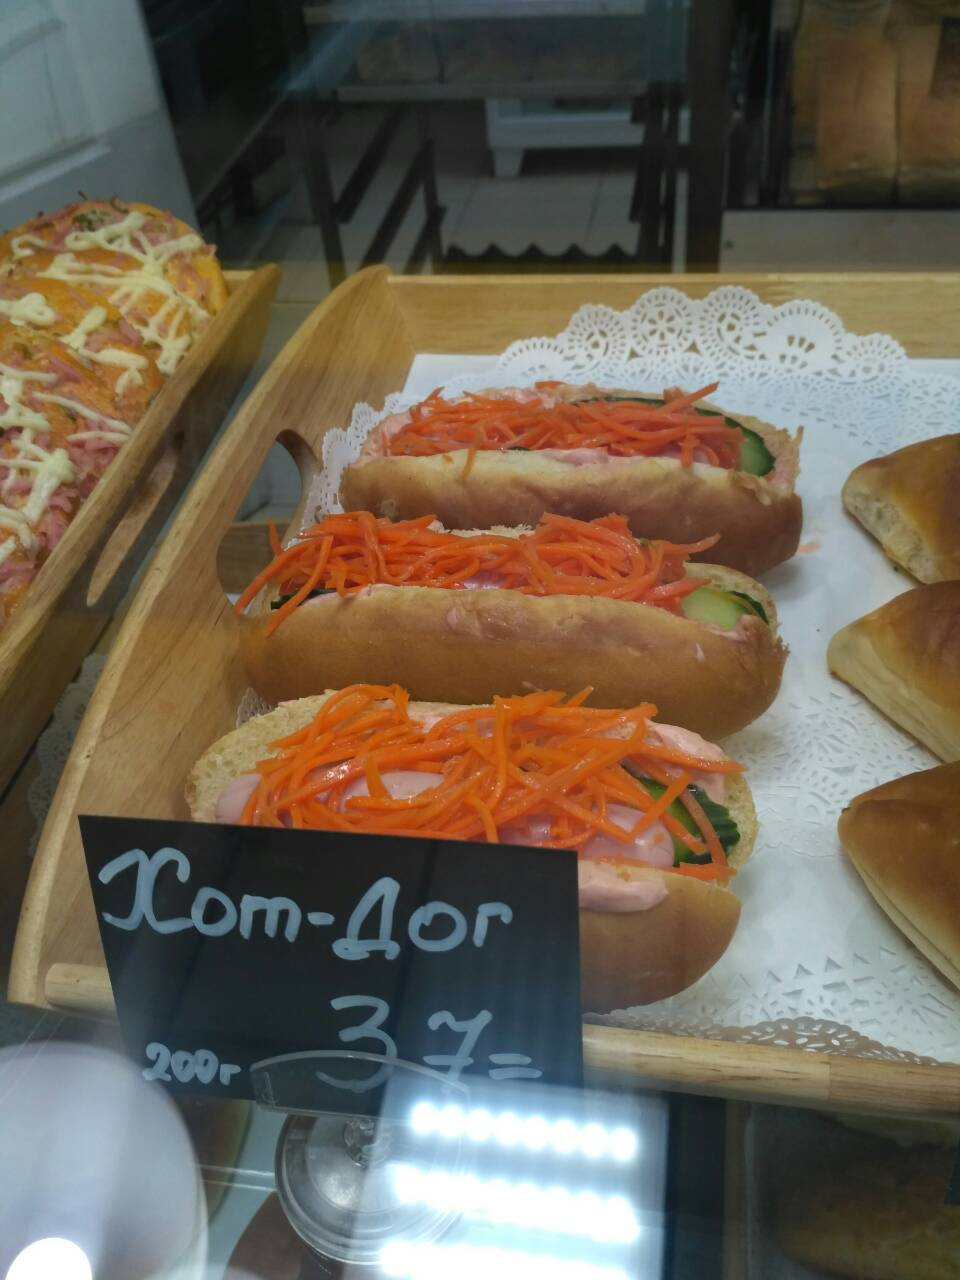 b534201a0e90 Хот-Дог от любимой пекарни   Любимая пекарня   свежая выпечка   пироги на  заказ   Йошкар-Ола